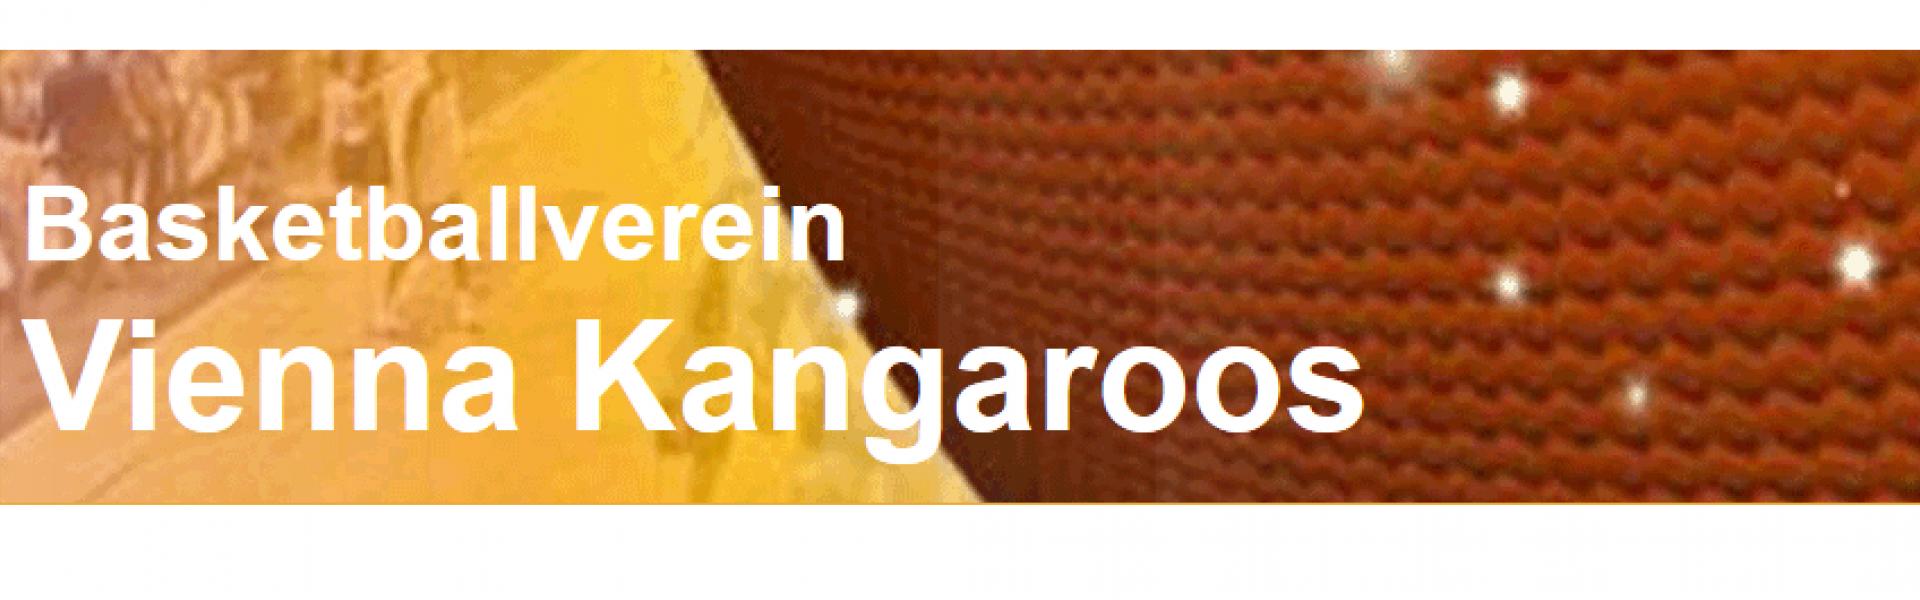 Basketballverein Vienna Kangaroos cover